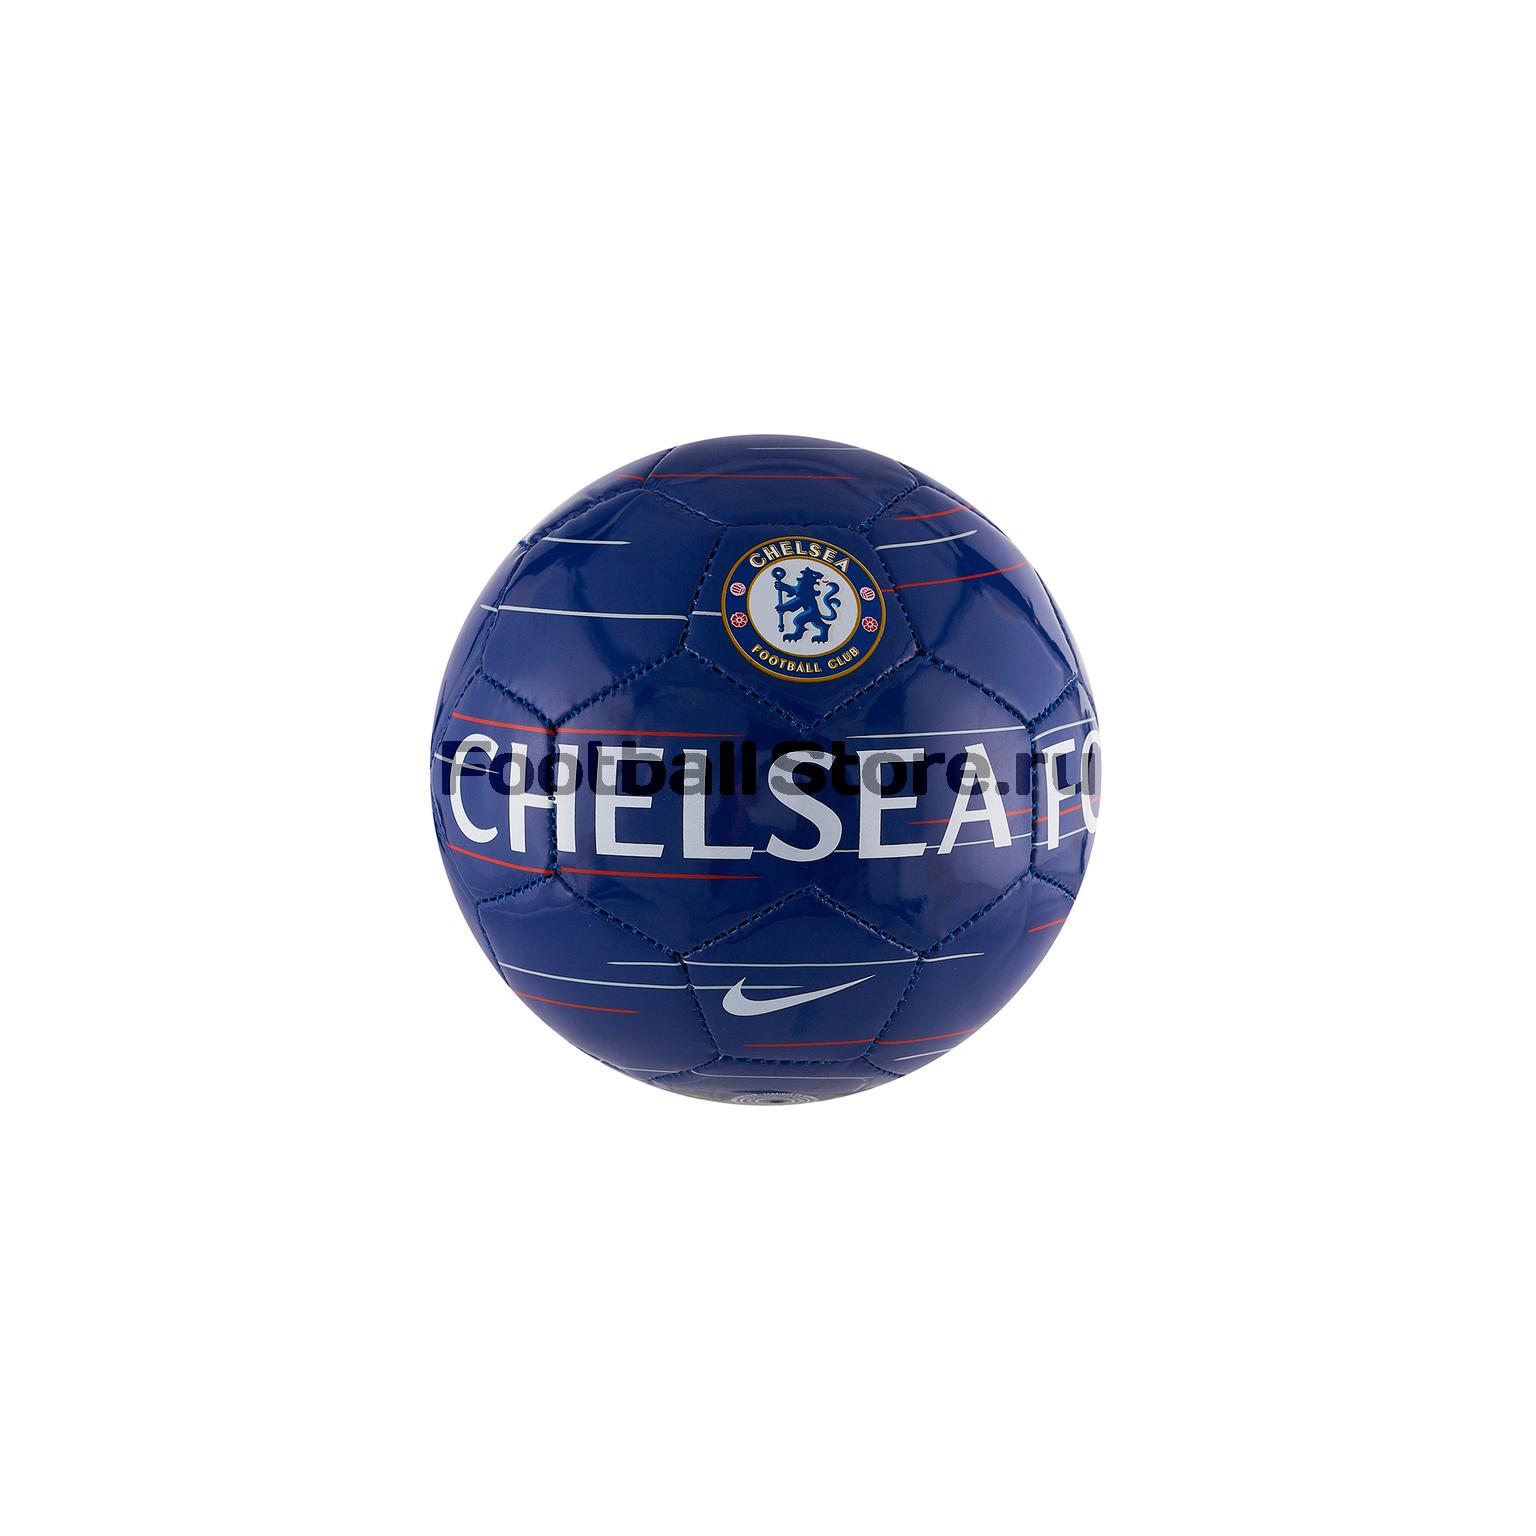 Мяч сувенирный Nike Chelsea SC3336-495 цена 2017